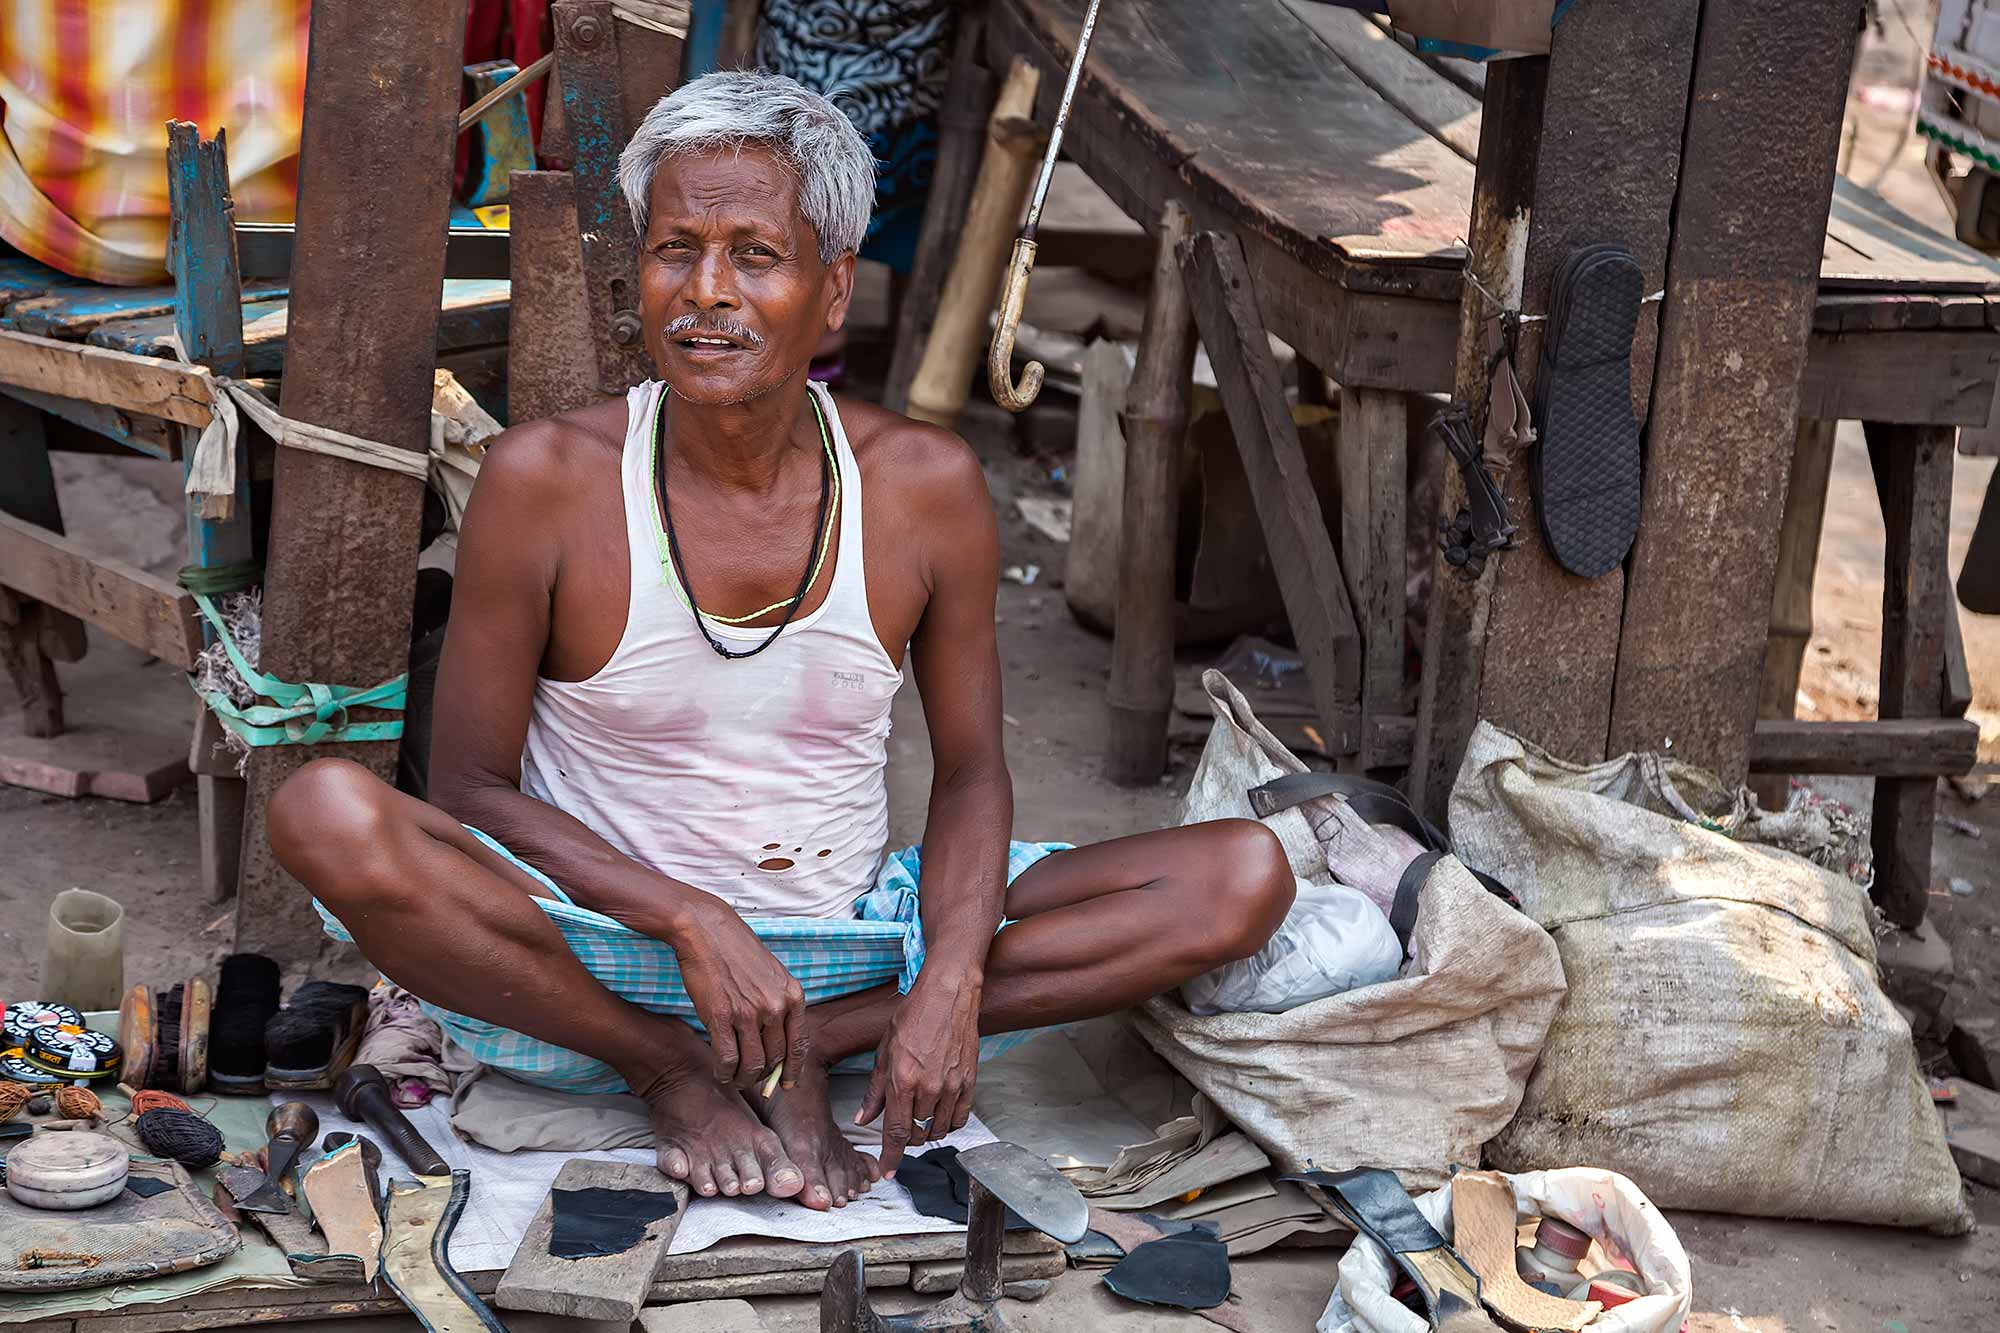 shoe-maker-streets-kolkata-west-bengal-india-1-2